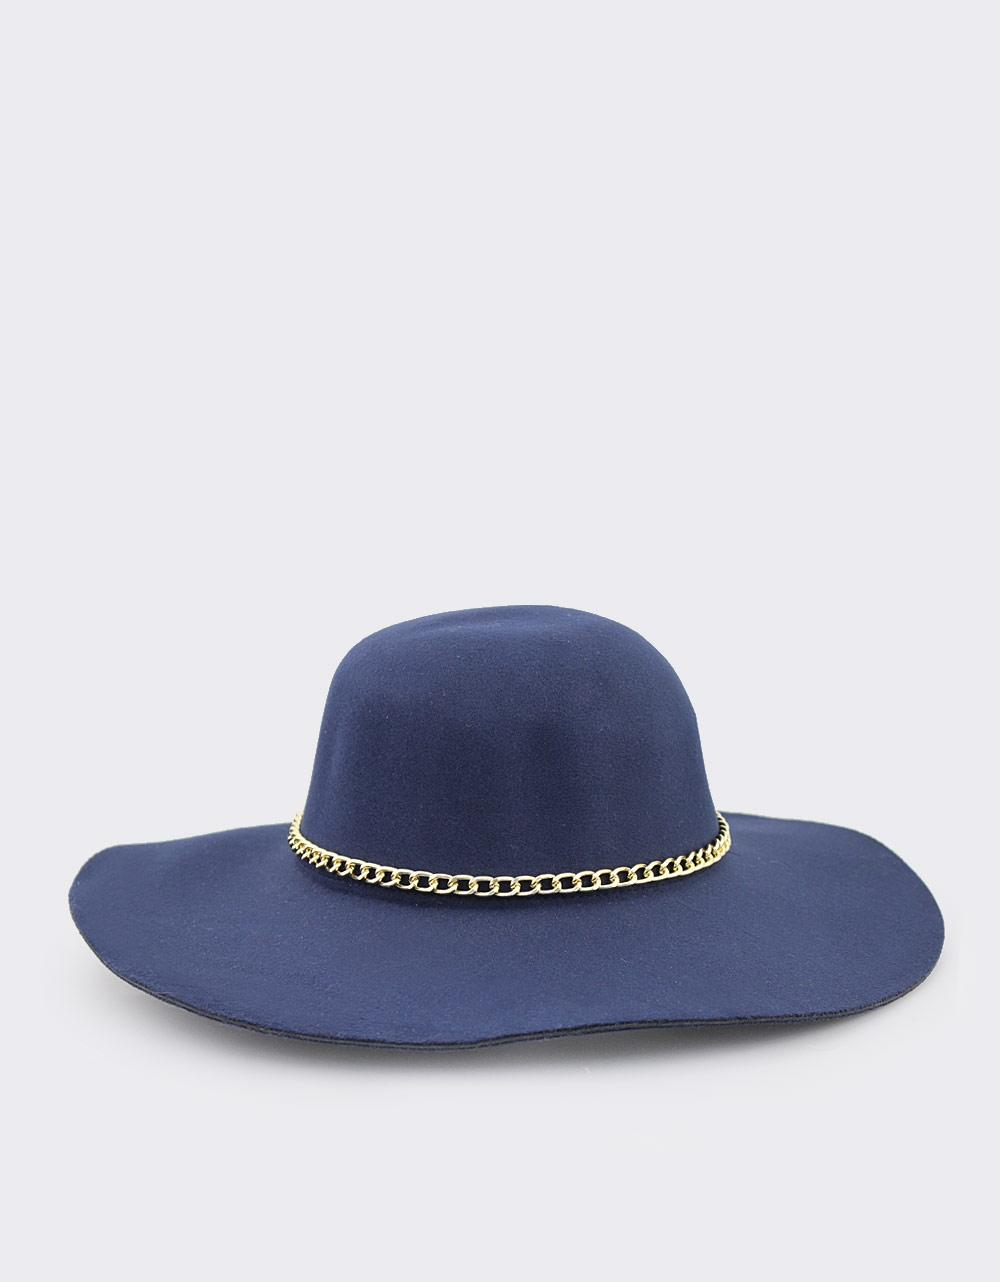 10e9760482 Εικόνα από Γυναικεία καπέλα με διακοσμητικό κρίκο Μπλε